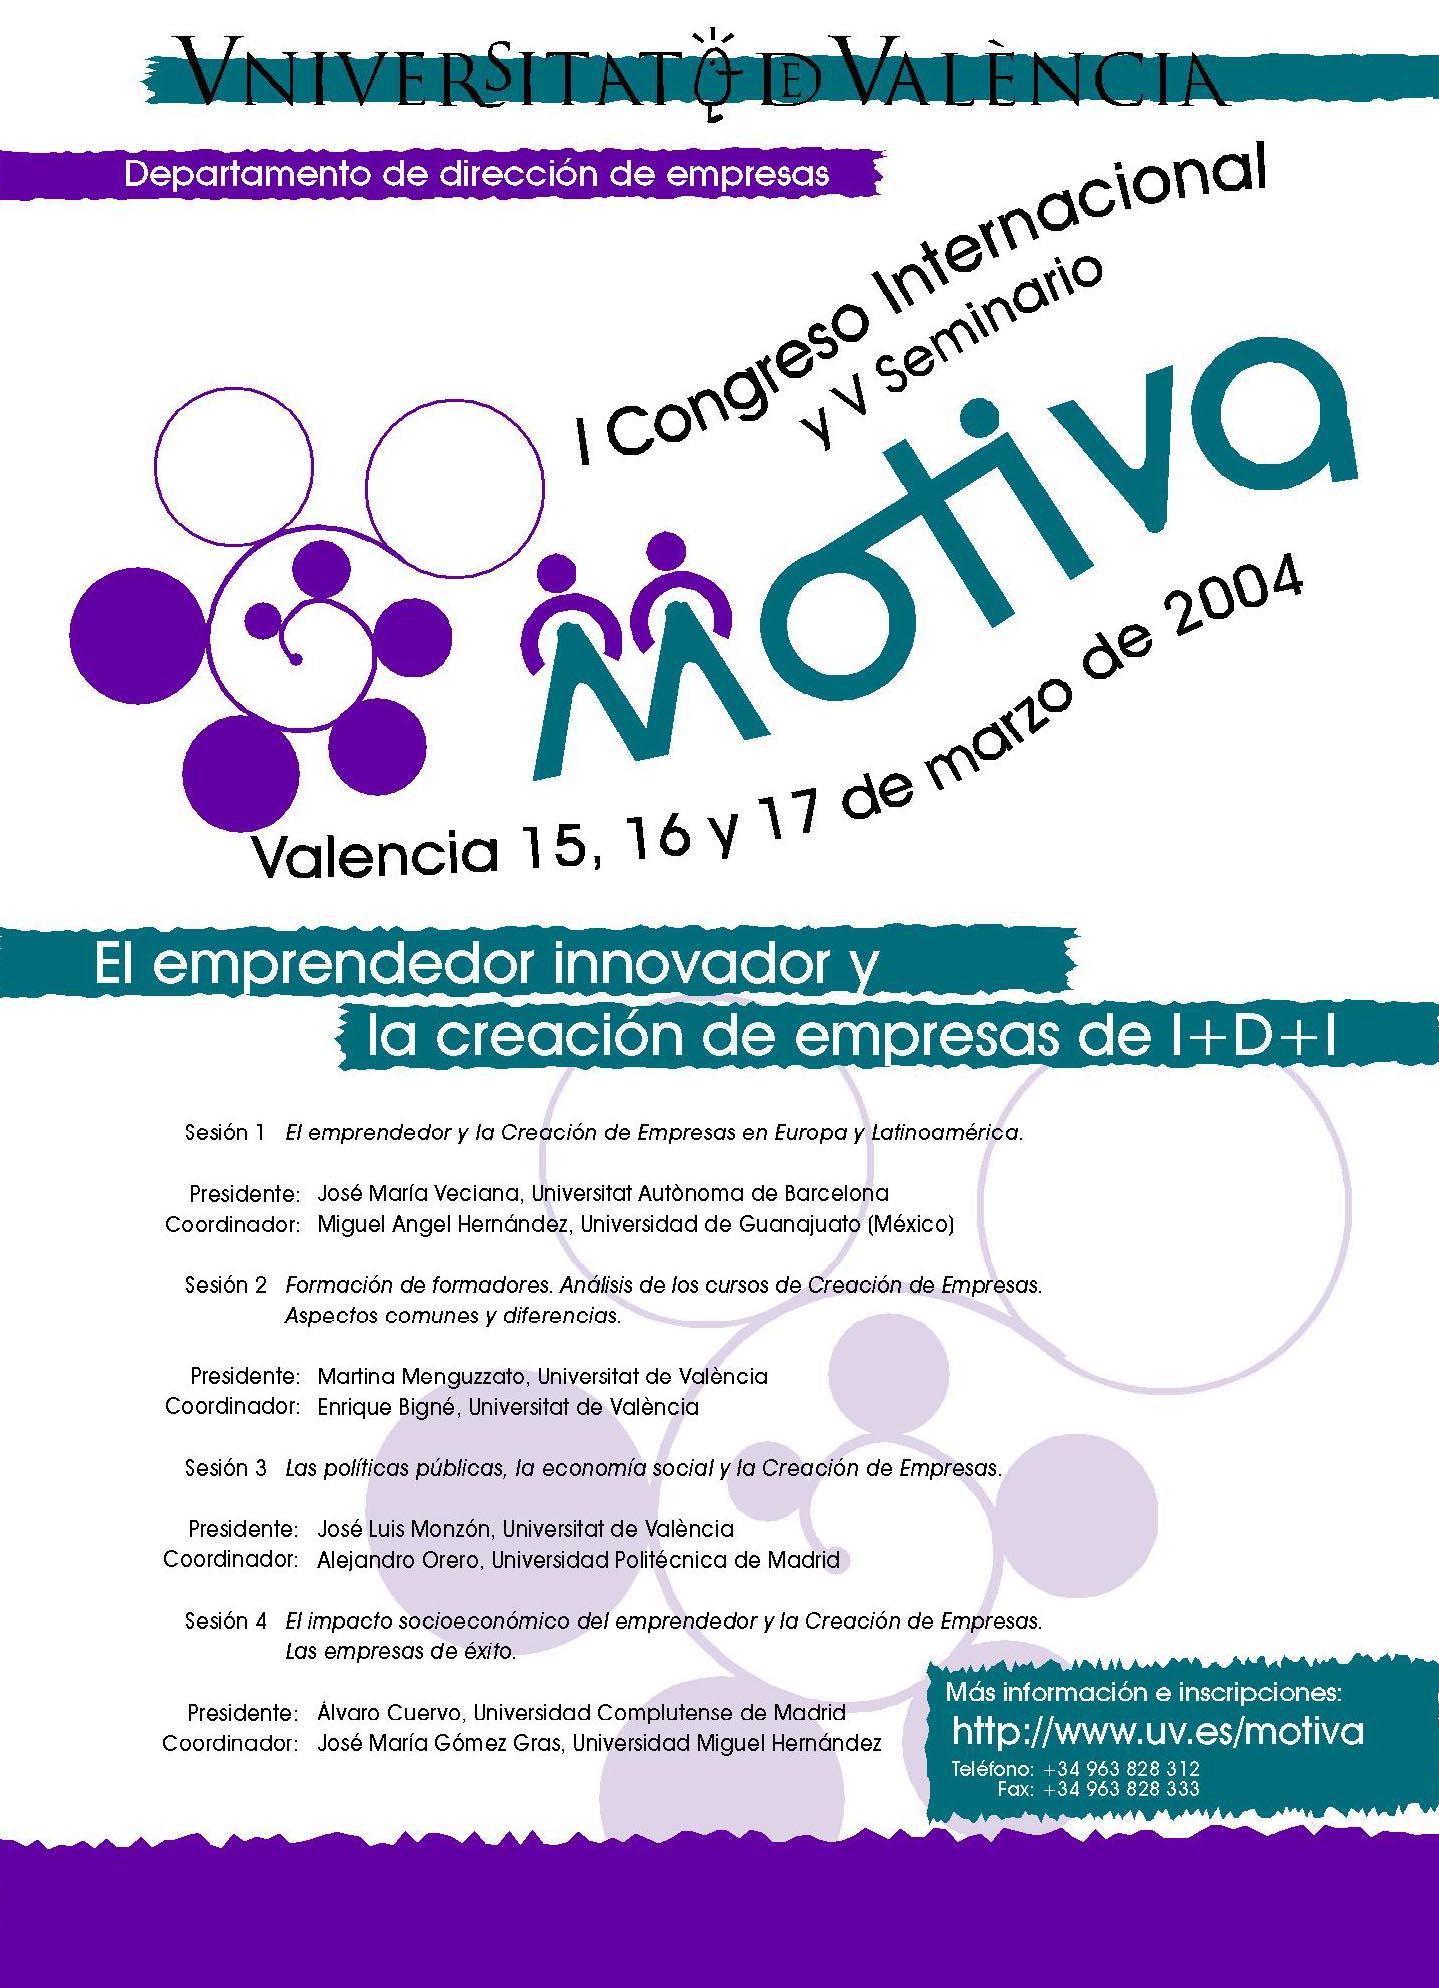 V Encuentro Motiva. España 2004